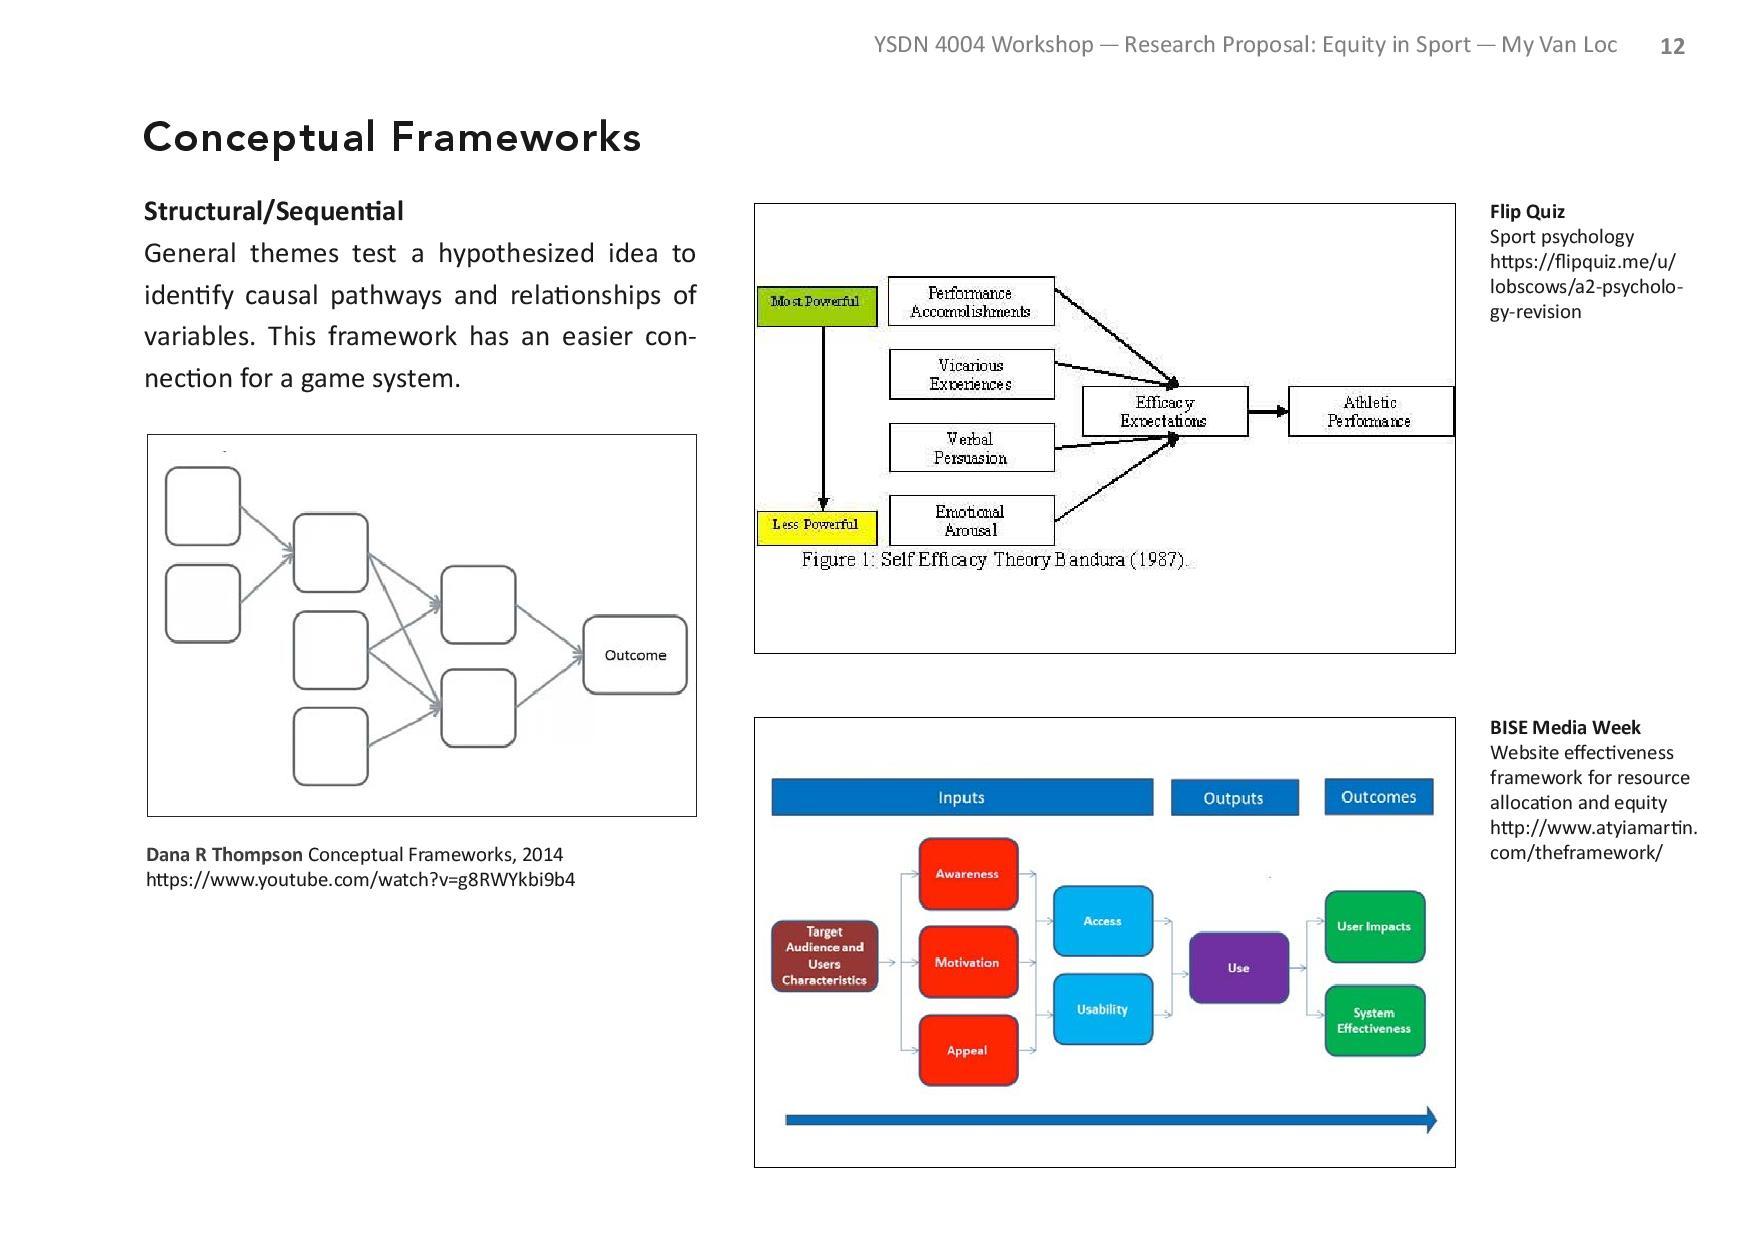 LocMy_ysdn4004_pr1_proposal-page-012.jpg